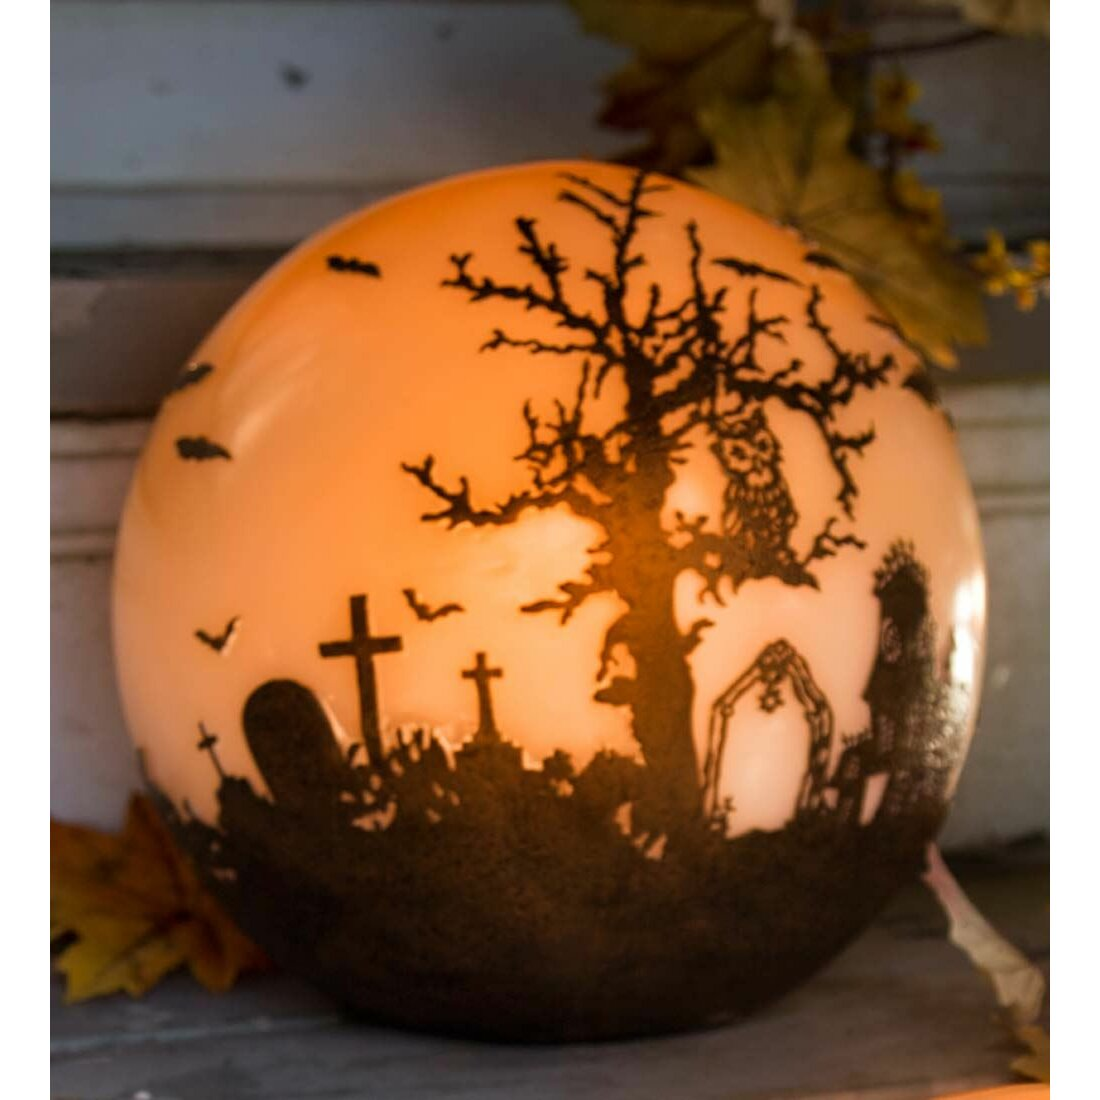 Plow Amp Hearth Halloween Glowing Luminary Globe Amp Reviews